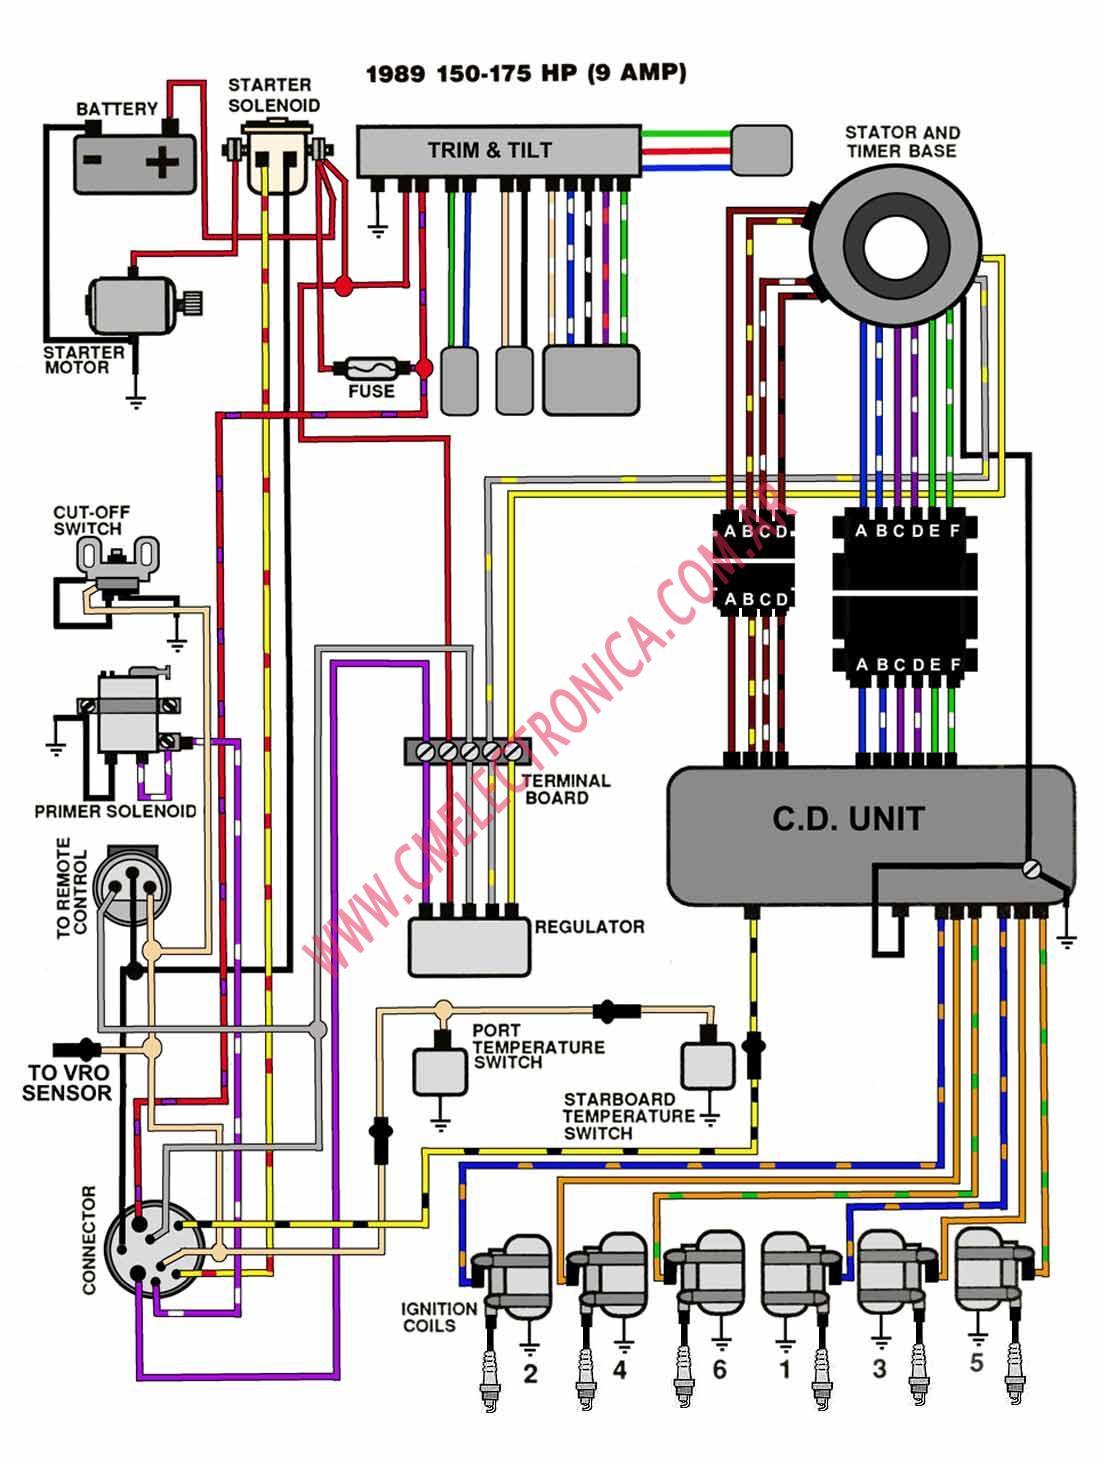 125 Hp Mercury Outboard Wiring Diagram Fs R9b Wiring Diagrams Duramaxxx Yenpancane Jeanjaures37 Fr